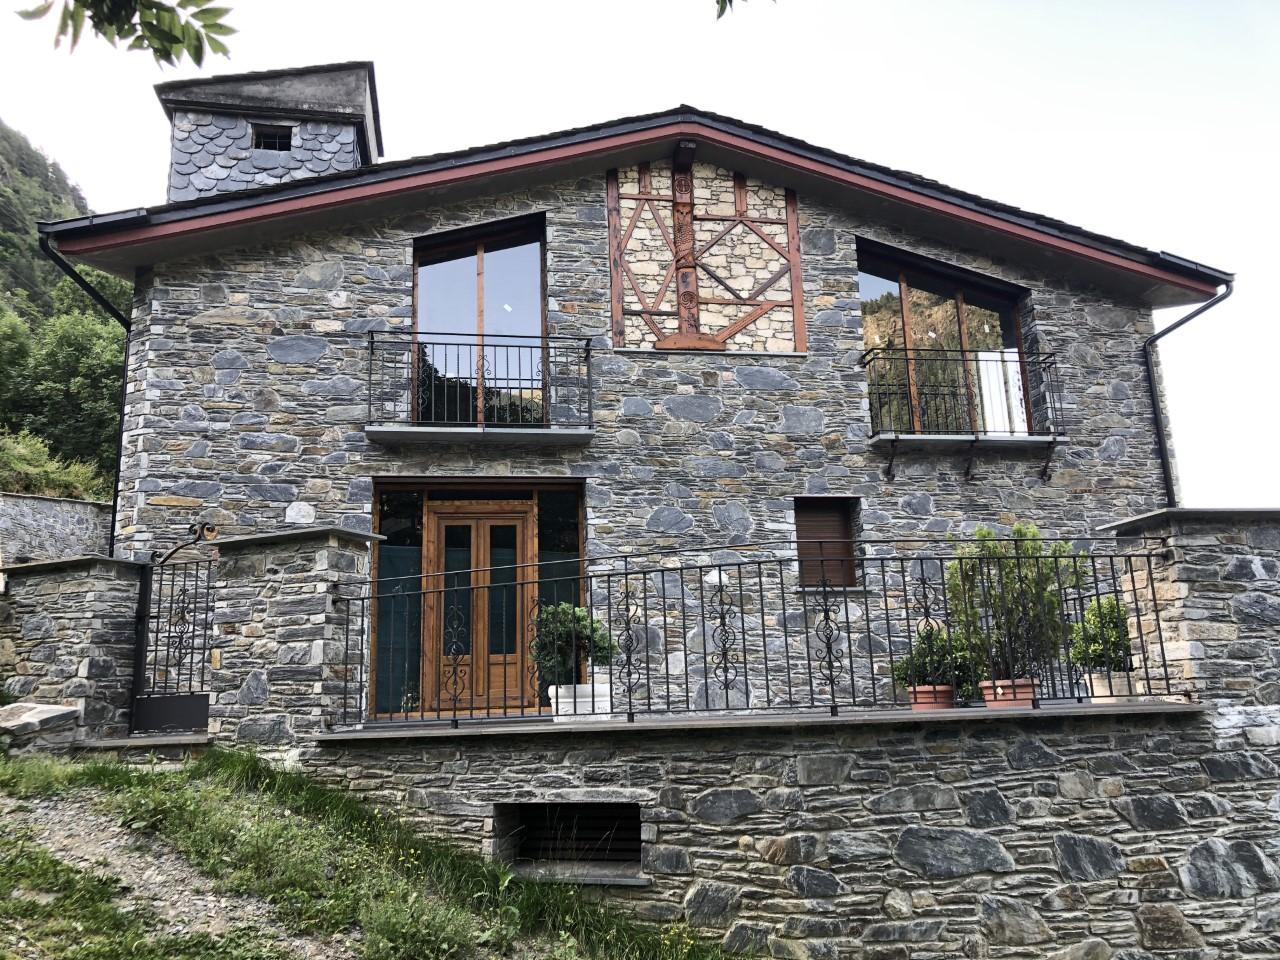 Xalet en venda a Meritxell, 4 habitacions, 679 metres